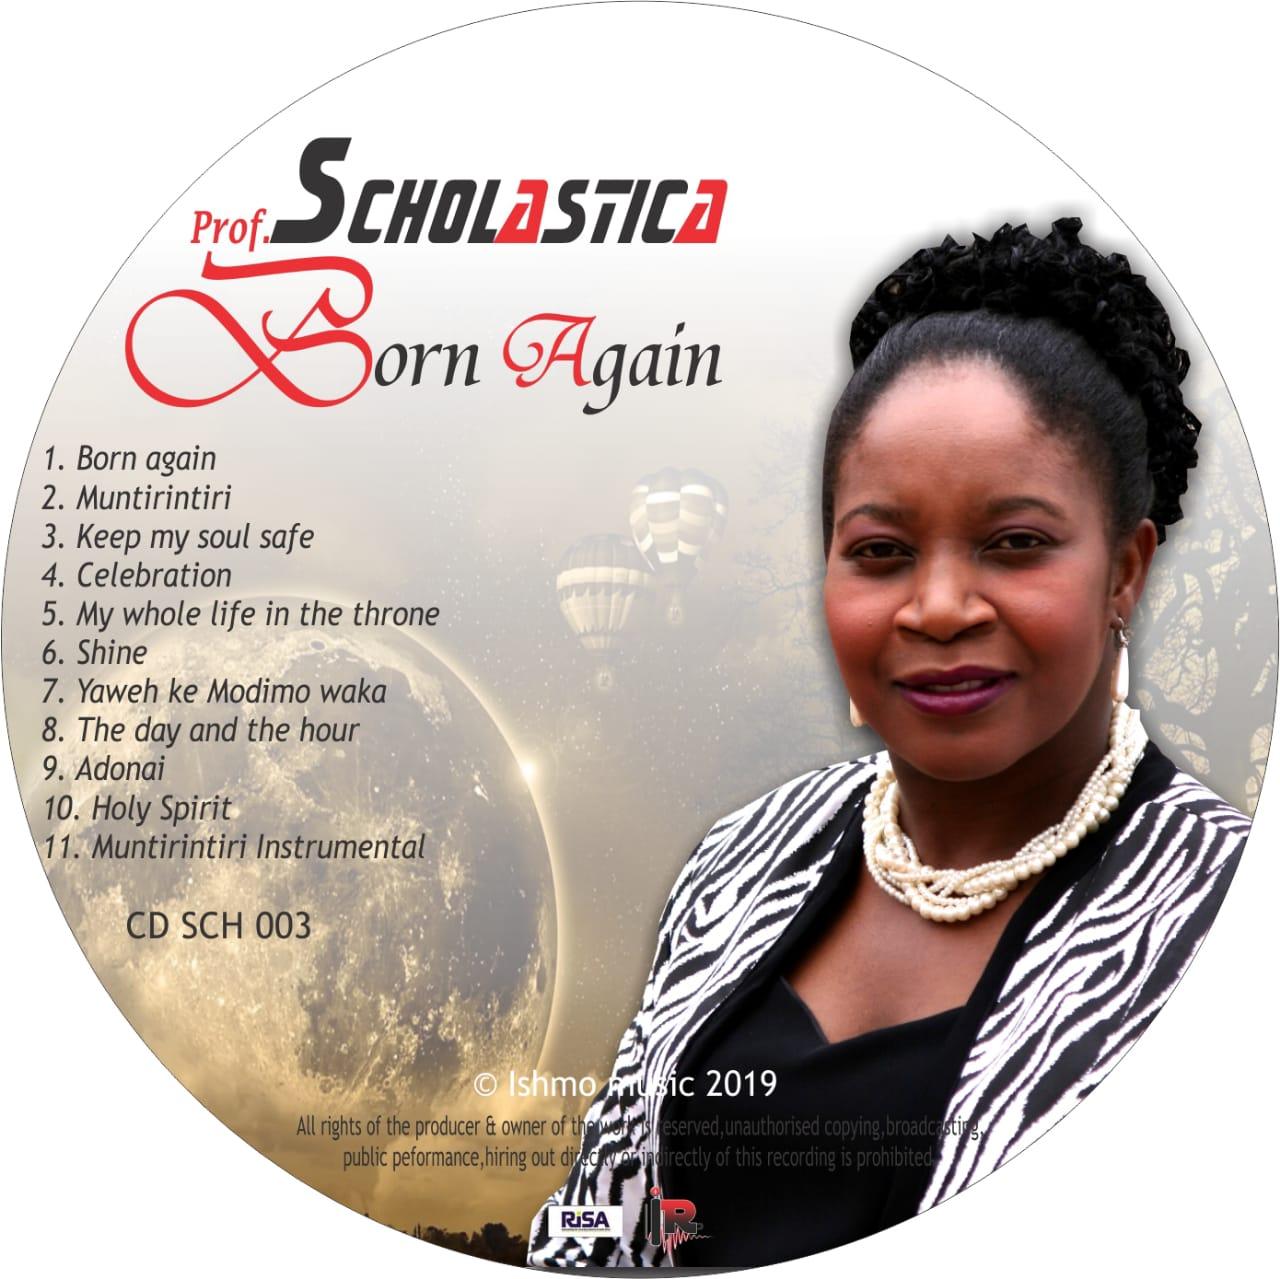 Prof Scholastica - Celebration